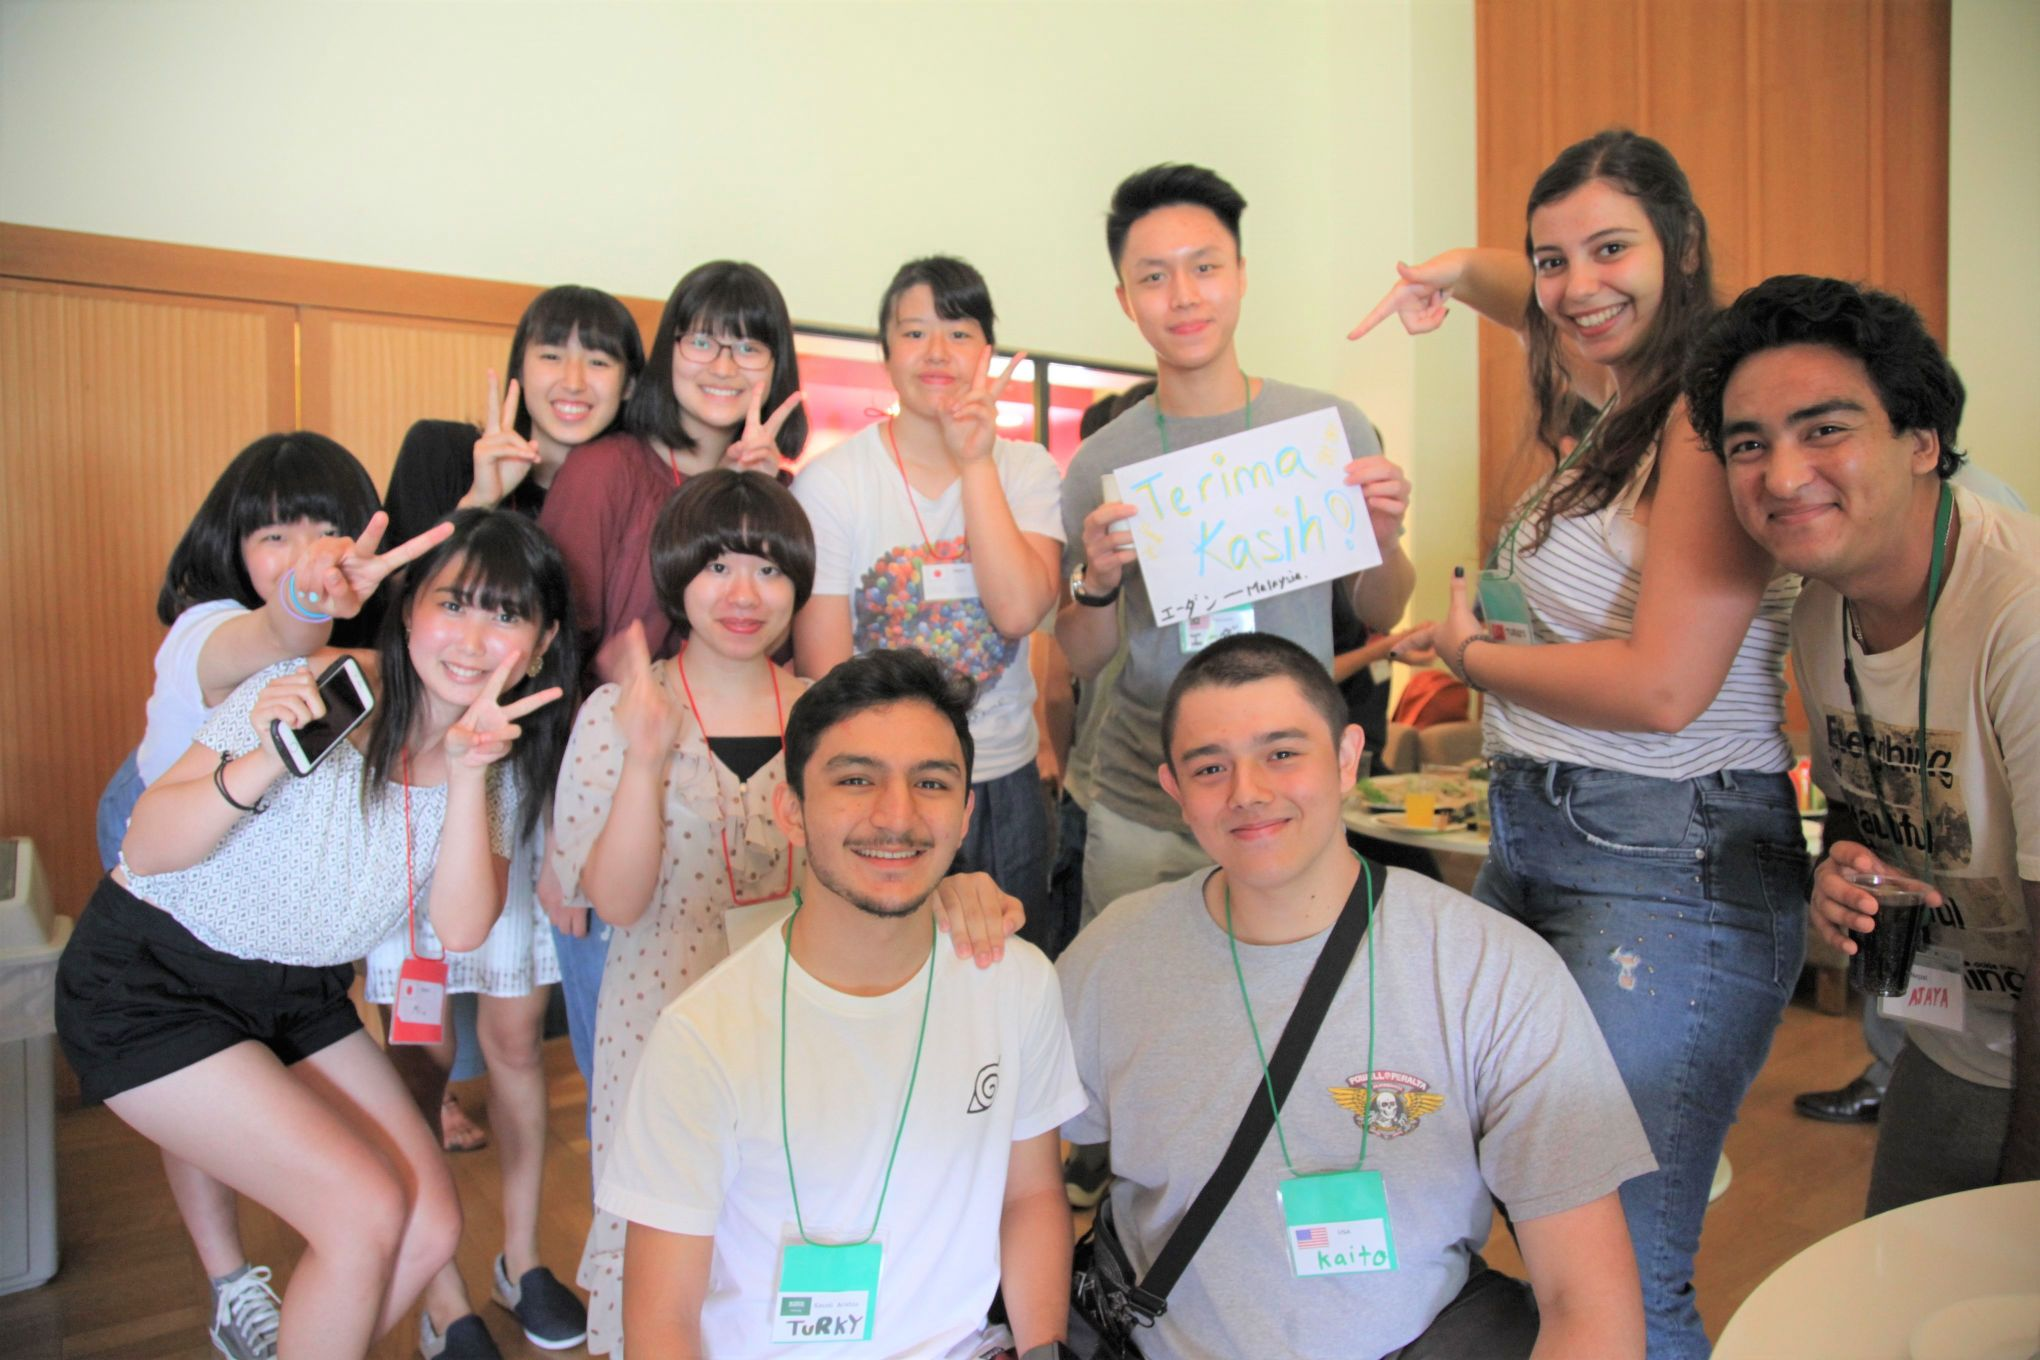 ISIおもてなし英語サマースクール2019留学生とアクティビティ 観光 交流 グローバル視野